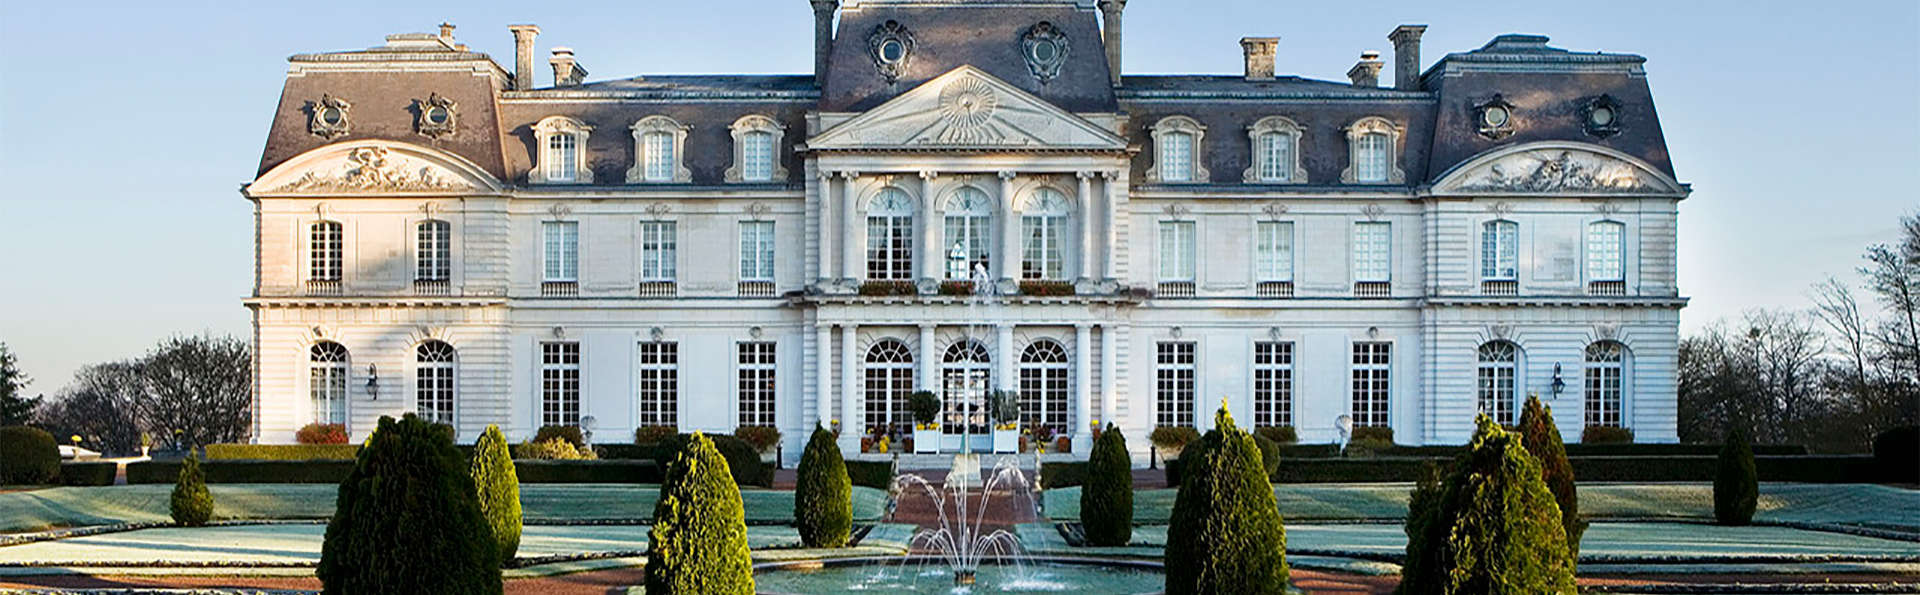 Chteau DArtigny 5  Montbazon France